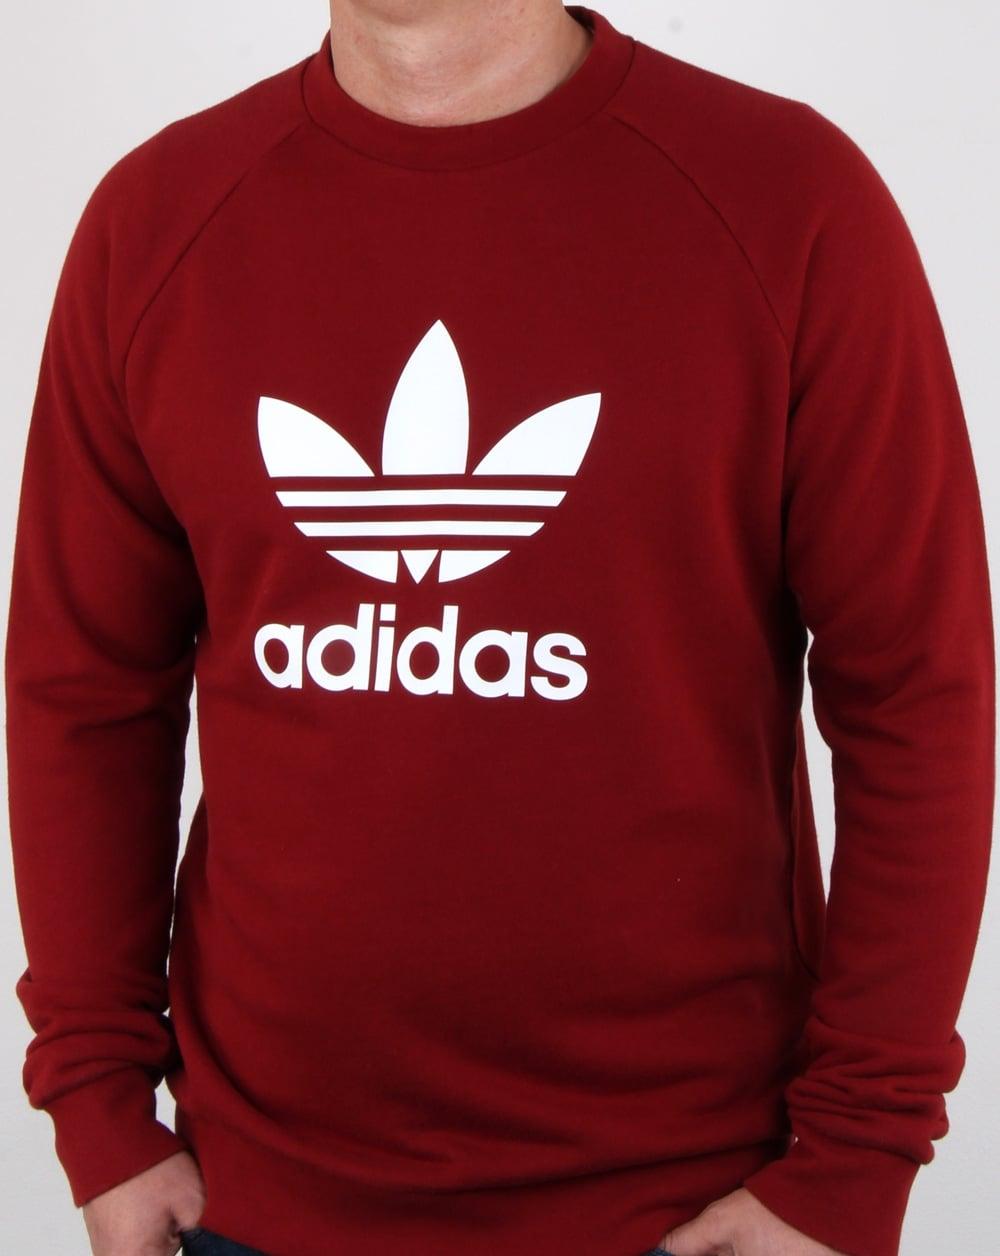 adidas Originals Adidas Originals Trefoil Sweatshirt Rust Red 14641fdcd75b